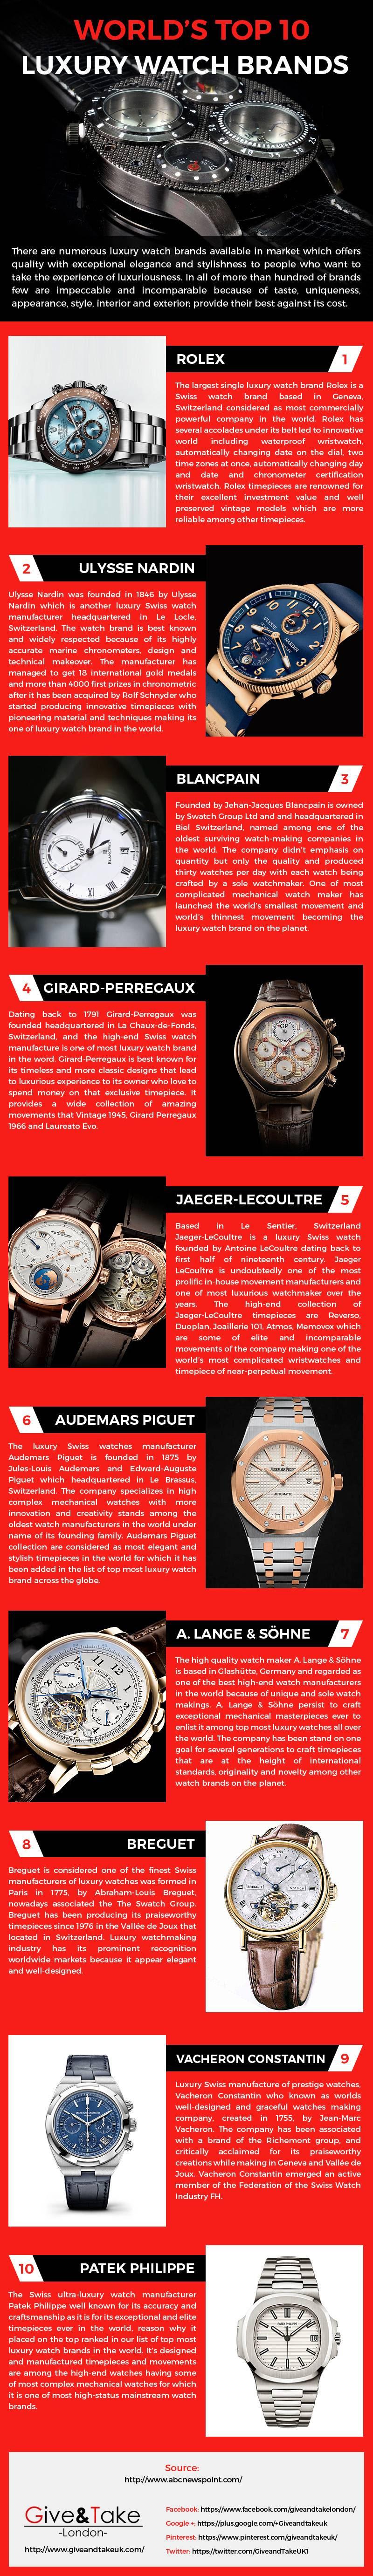 World's Top 10 Luxury Watch Brands